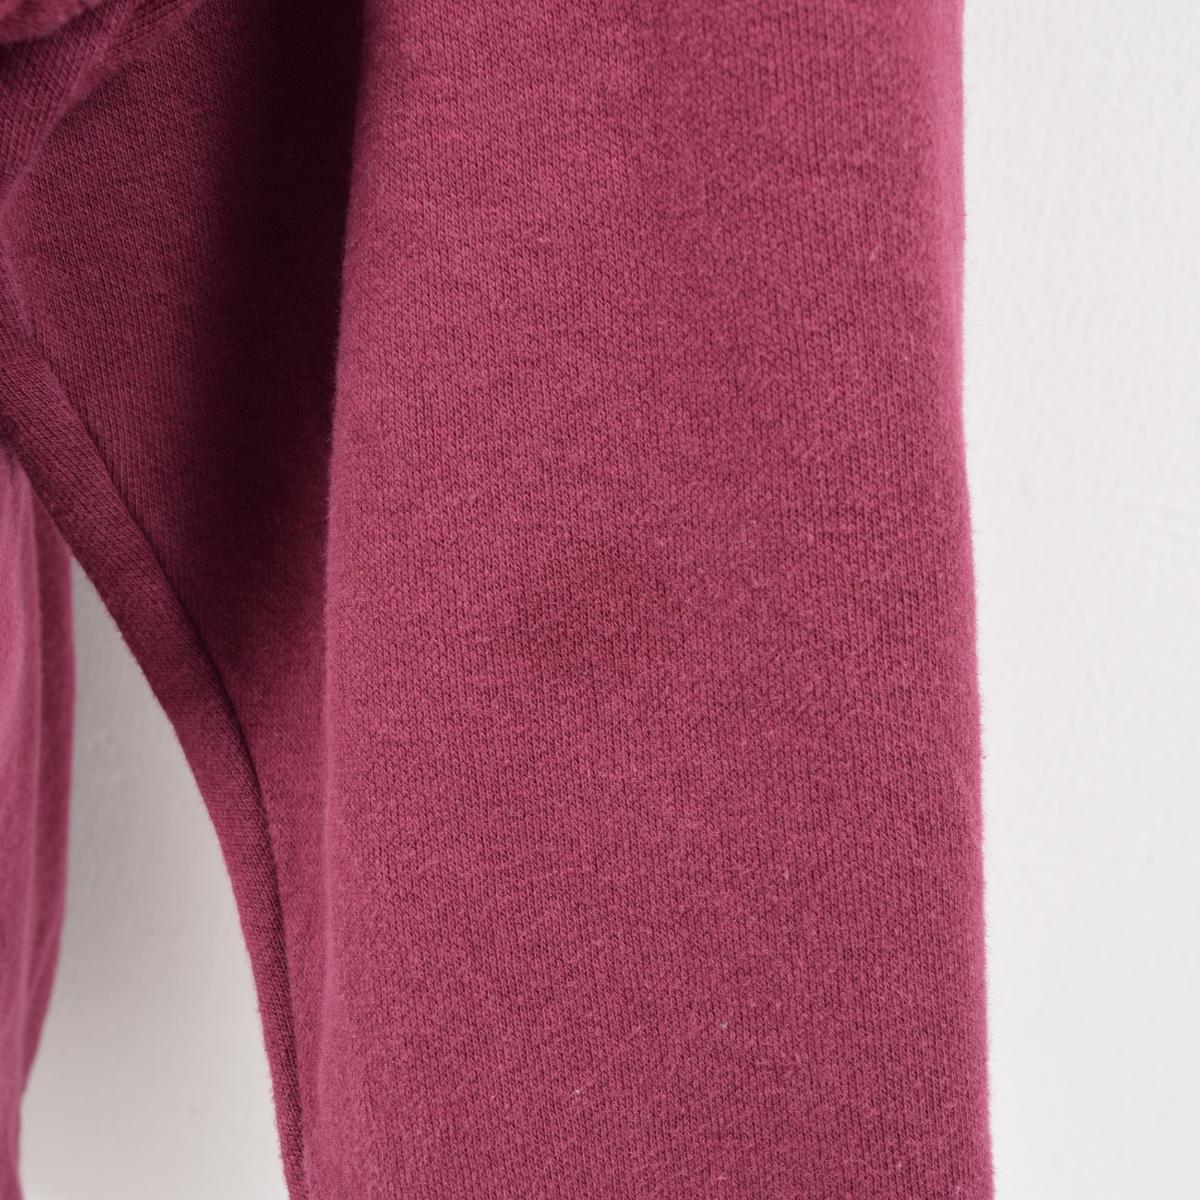 Nike NIKE TEAM college sweat shirt pullover parka men L wbb0245